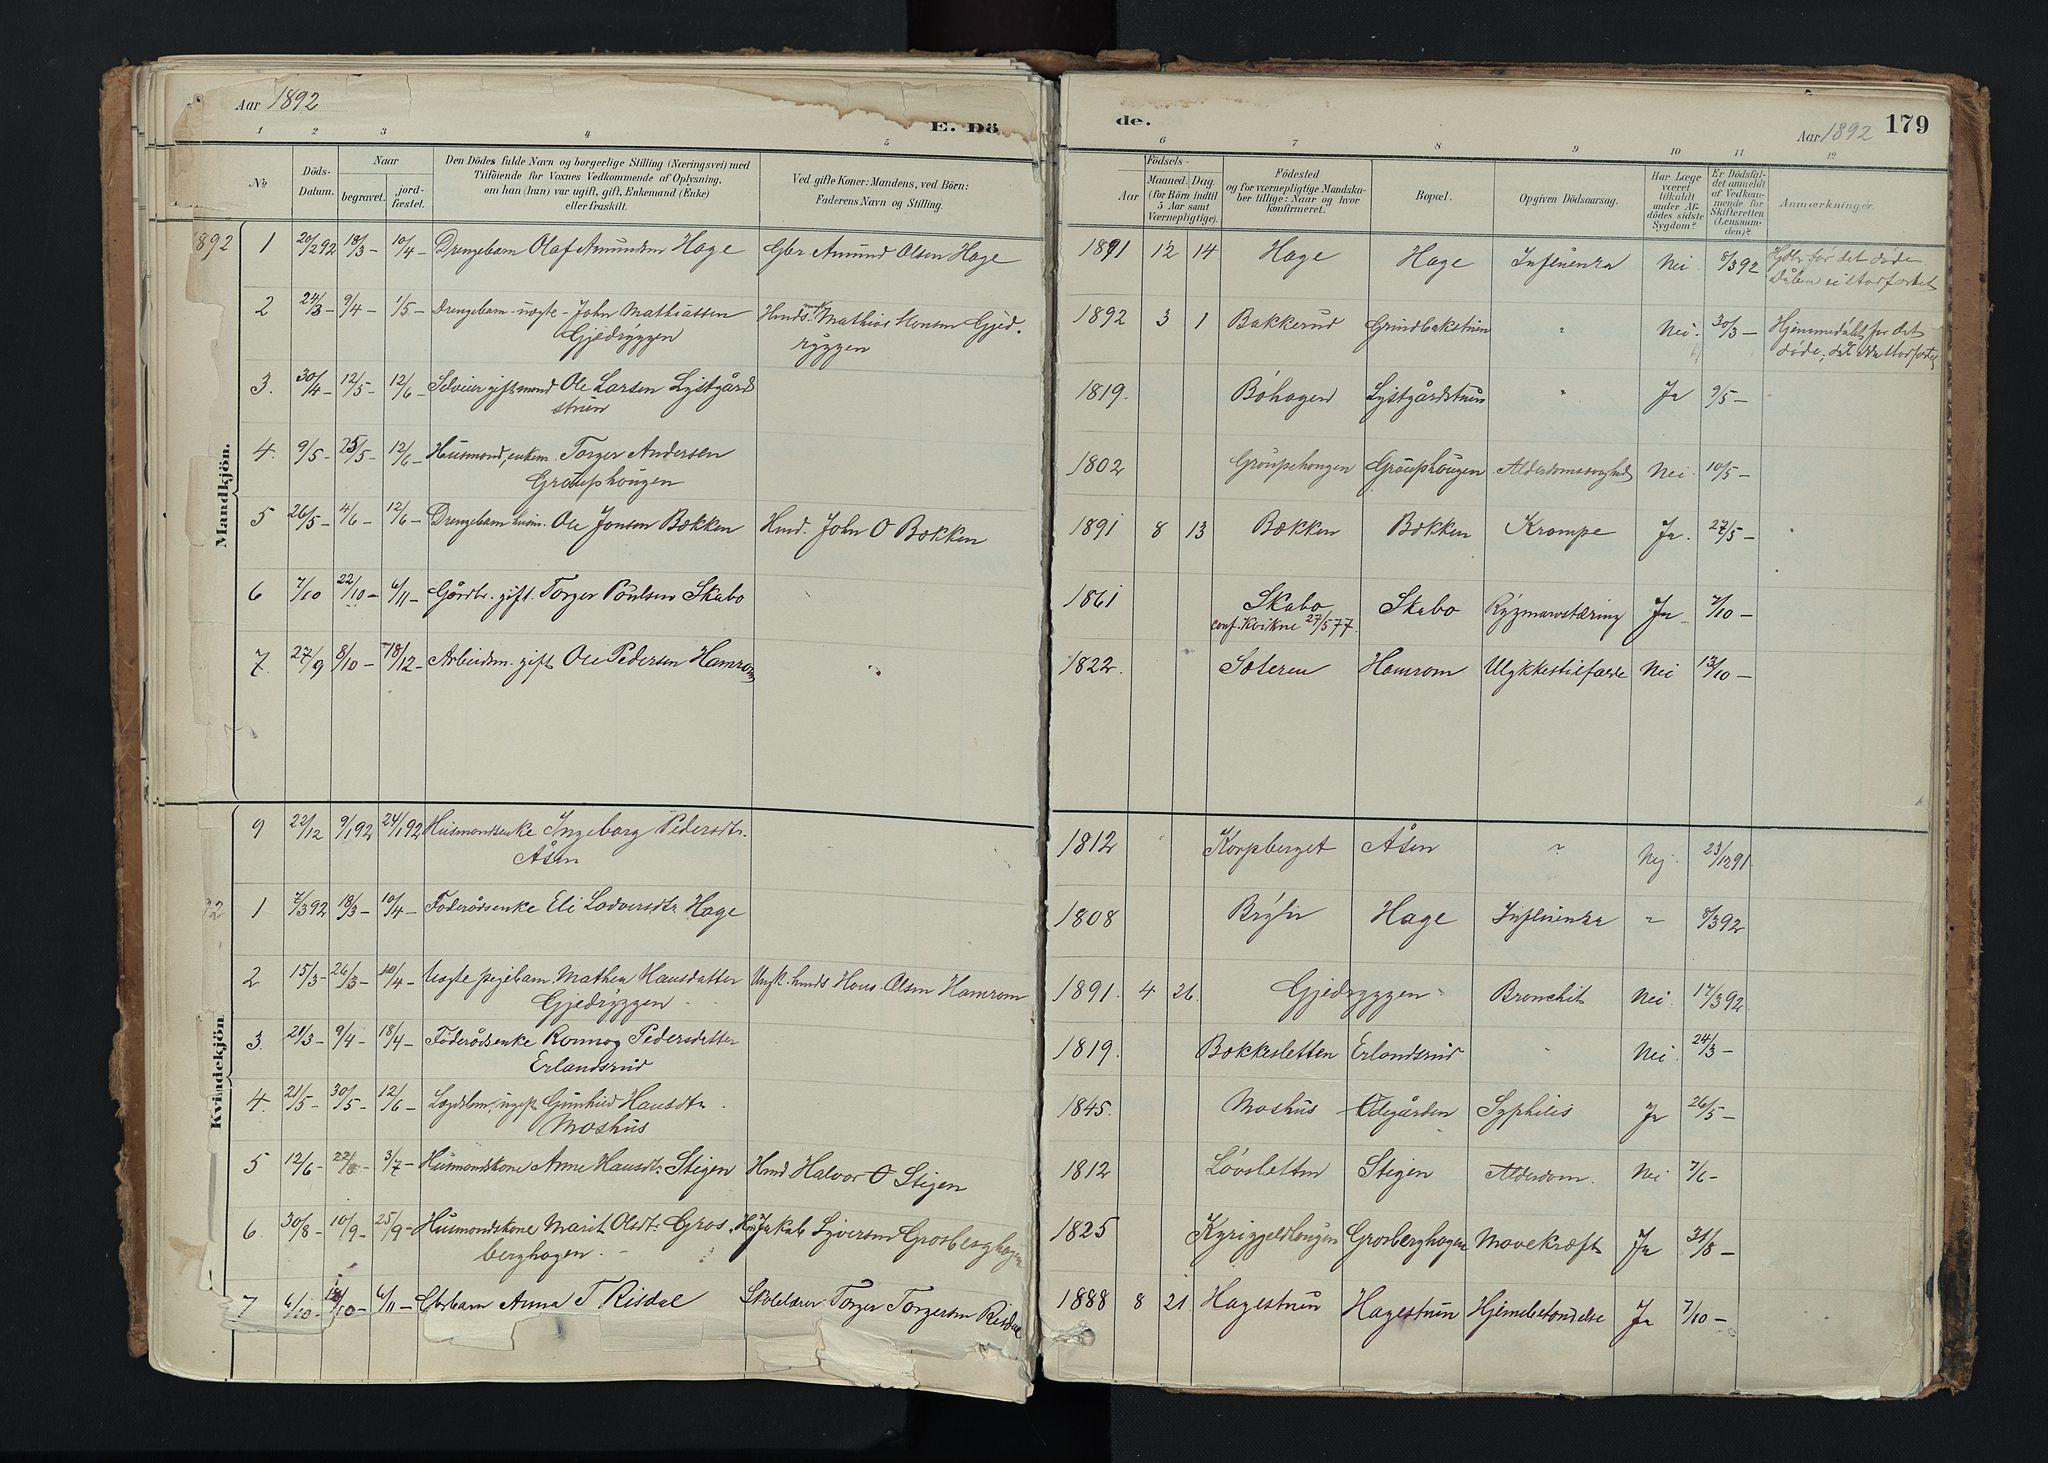 SAH, Nord-Fron prestekontor, Ministerialbok nr. 5, 1884-1914, s. 179